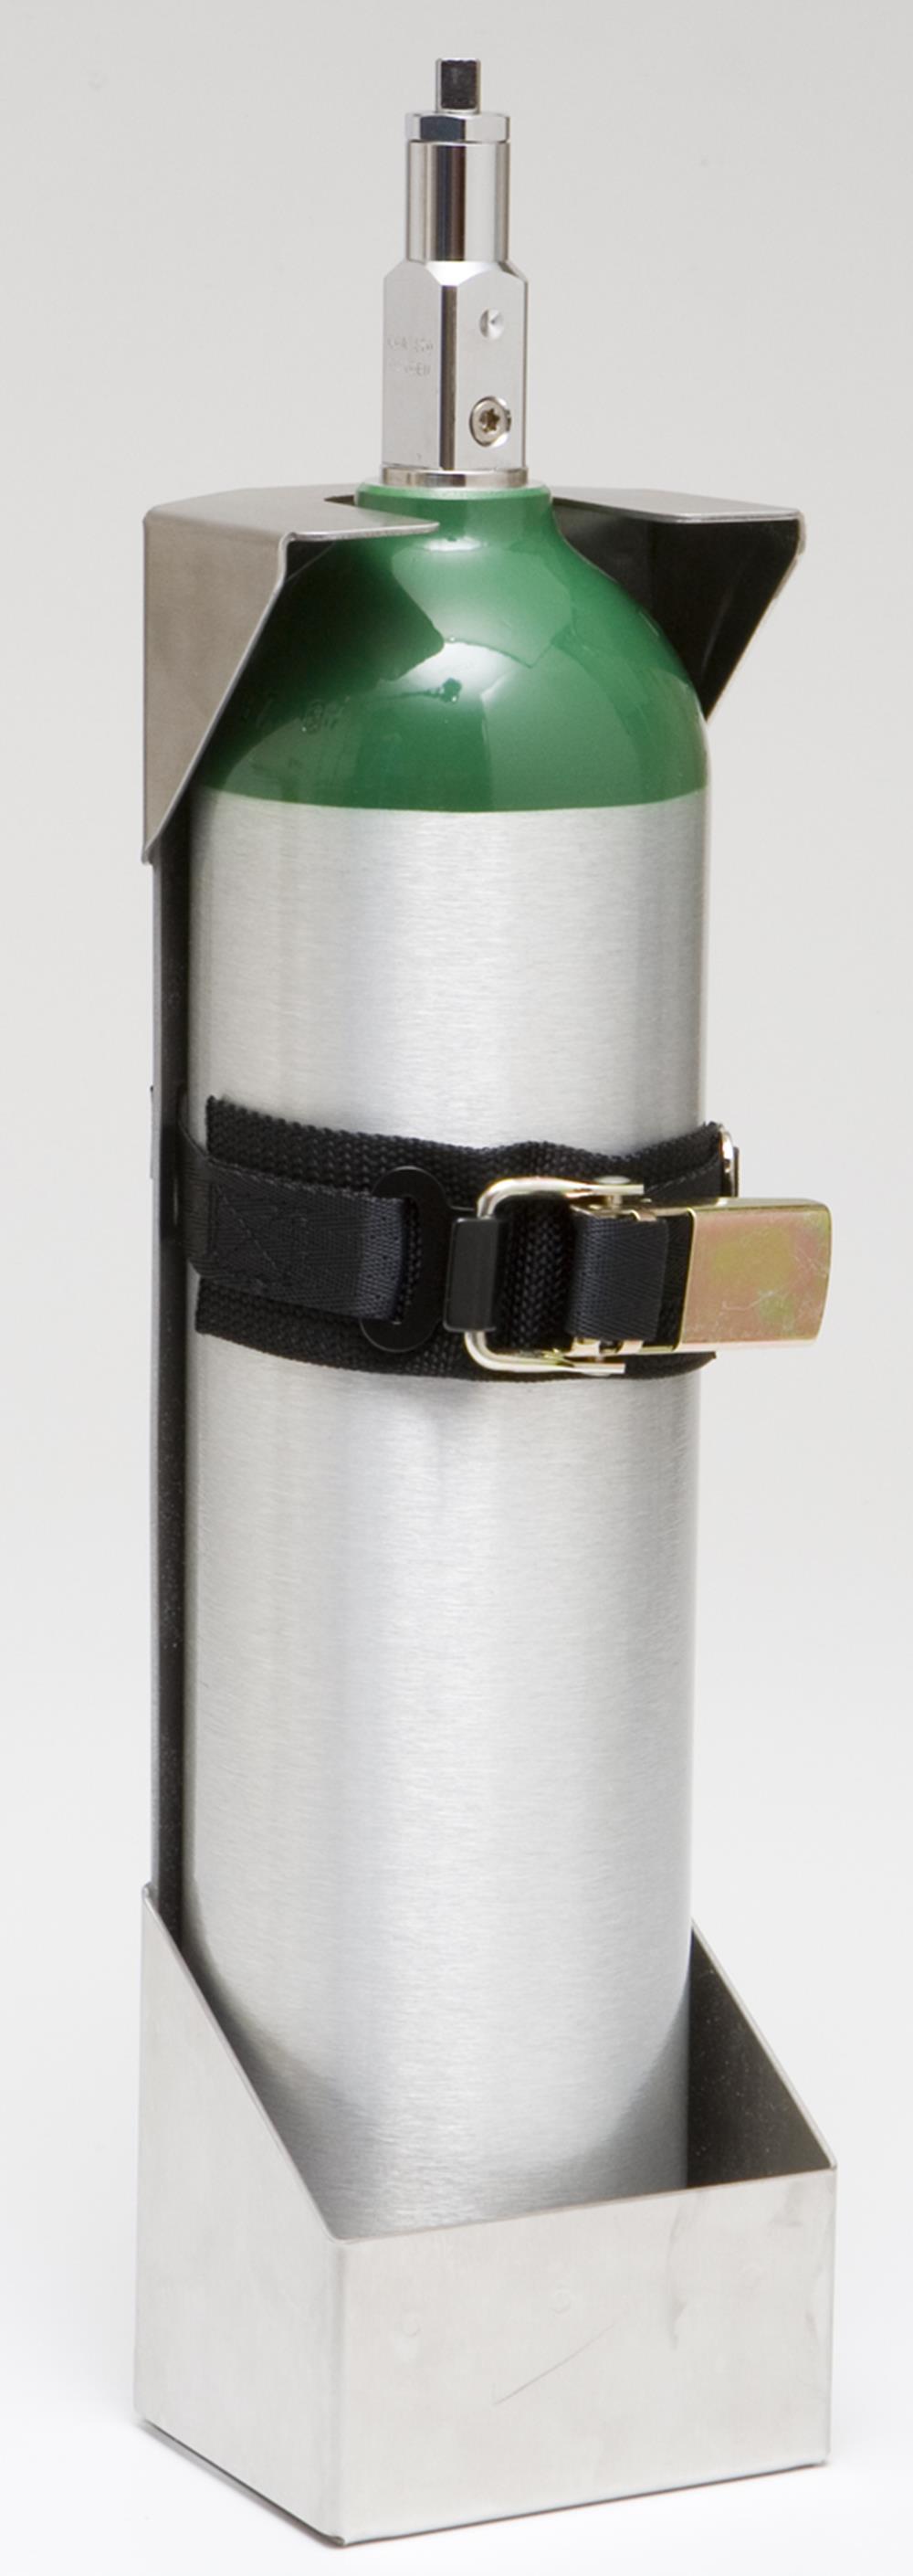 "Standard ""D"" Cylinder Bracket with Strap"